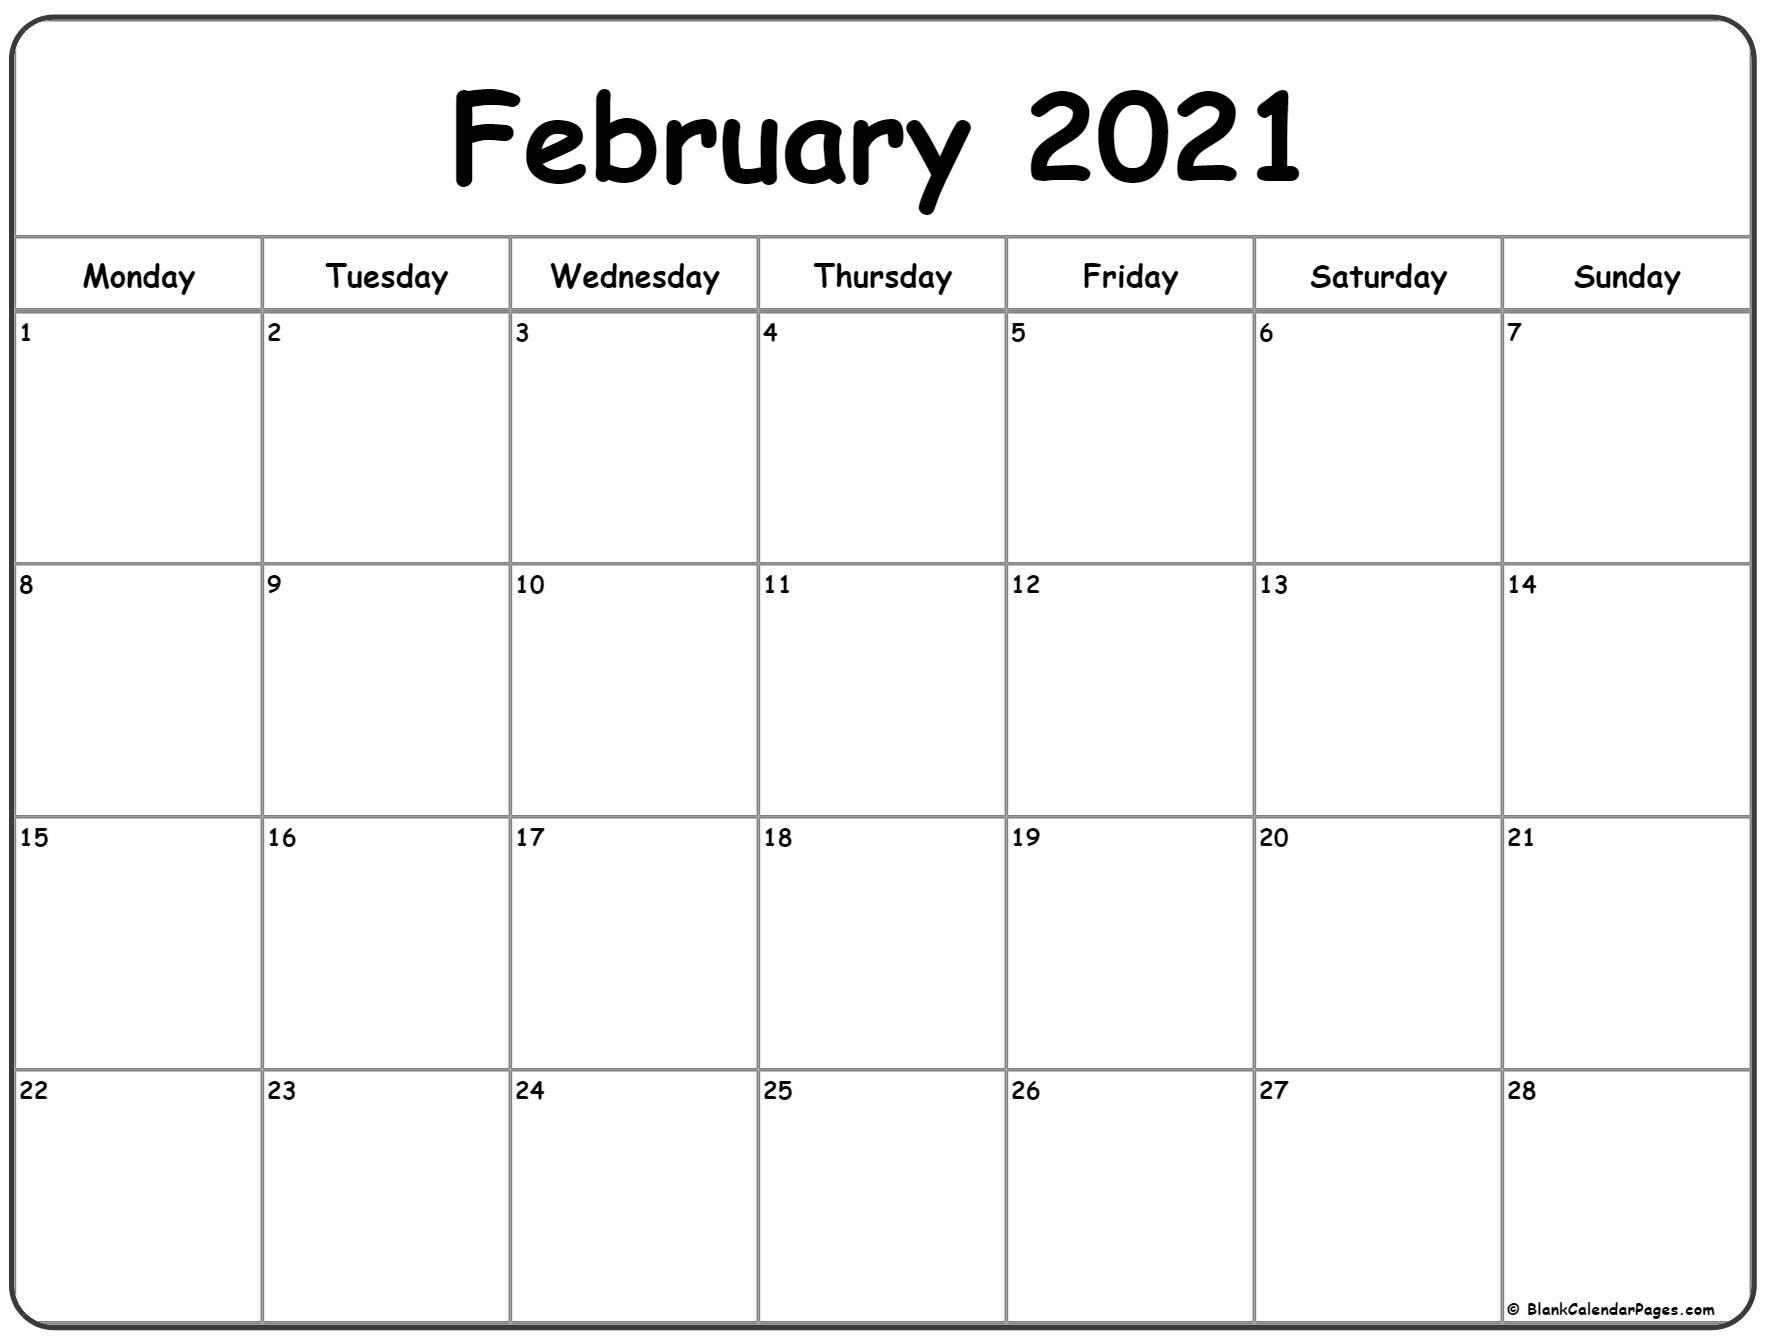 February 2021 Monday Calendar   Monday To Sunday One Week Monday Through Saturday Communication Calendar